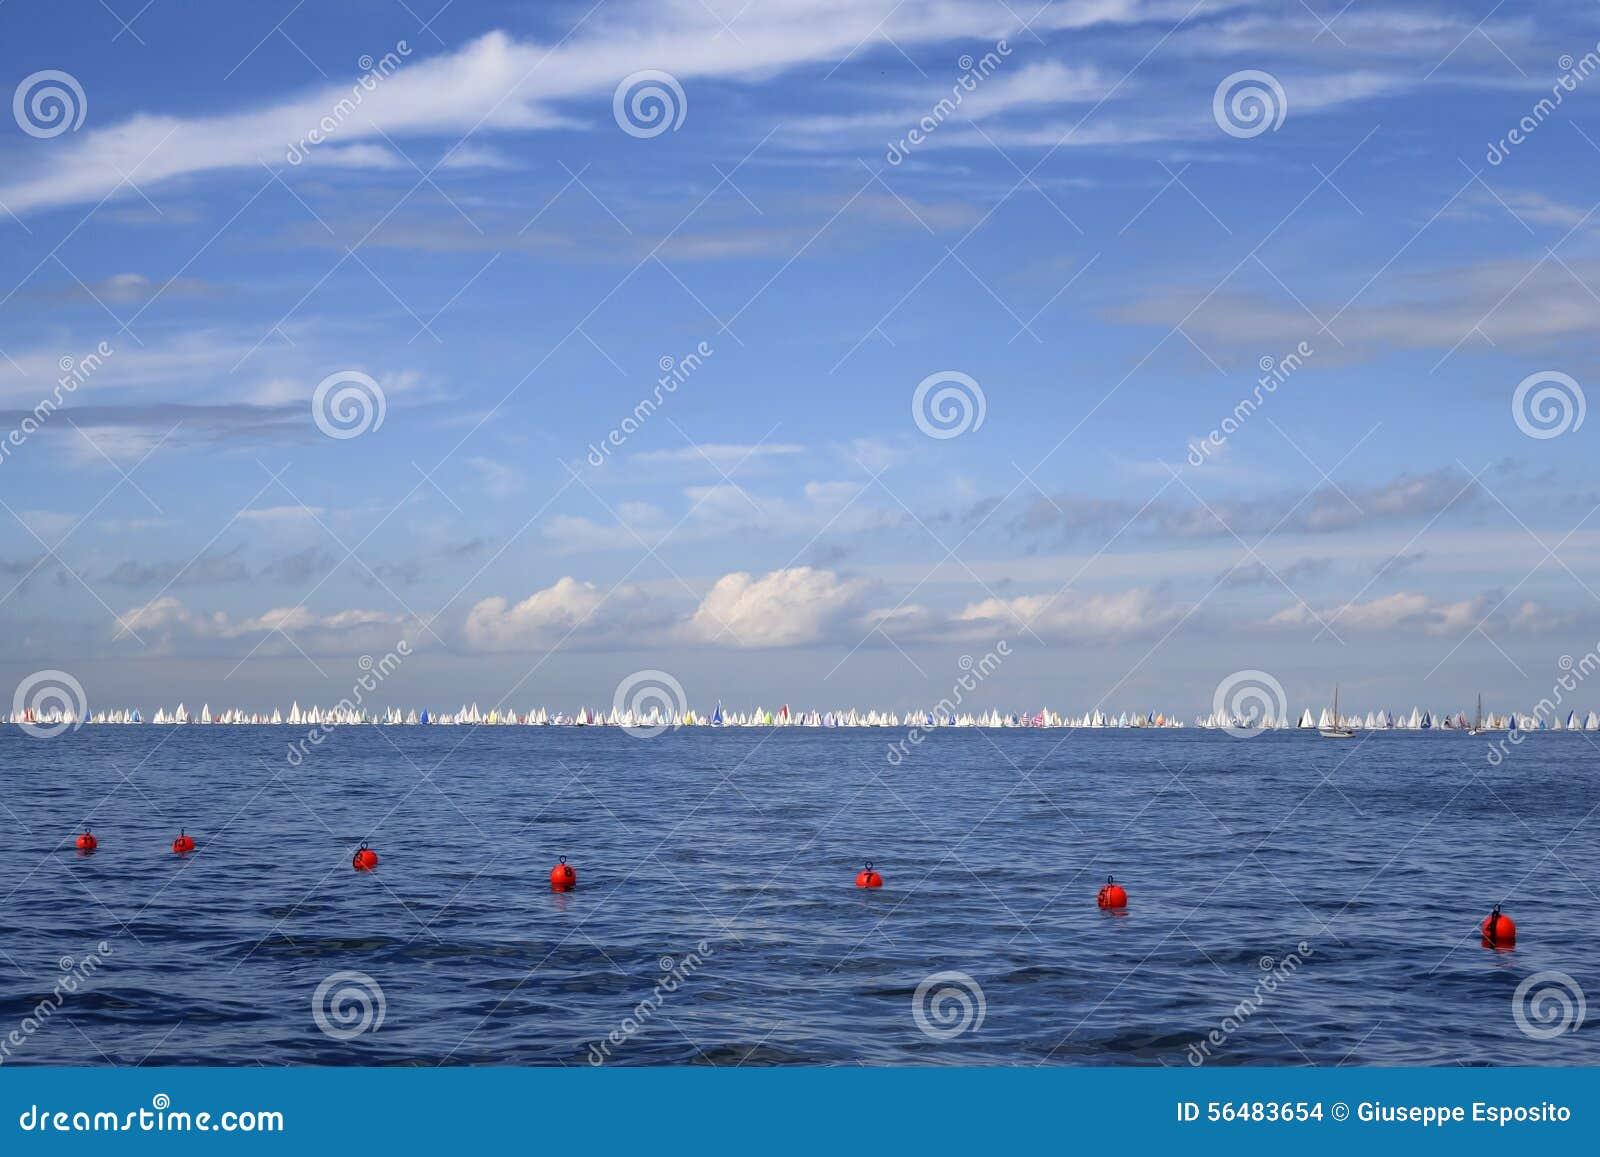 Course de navigation Barcolana trieste